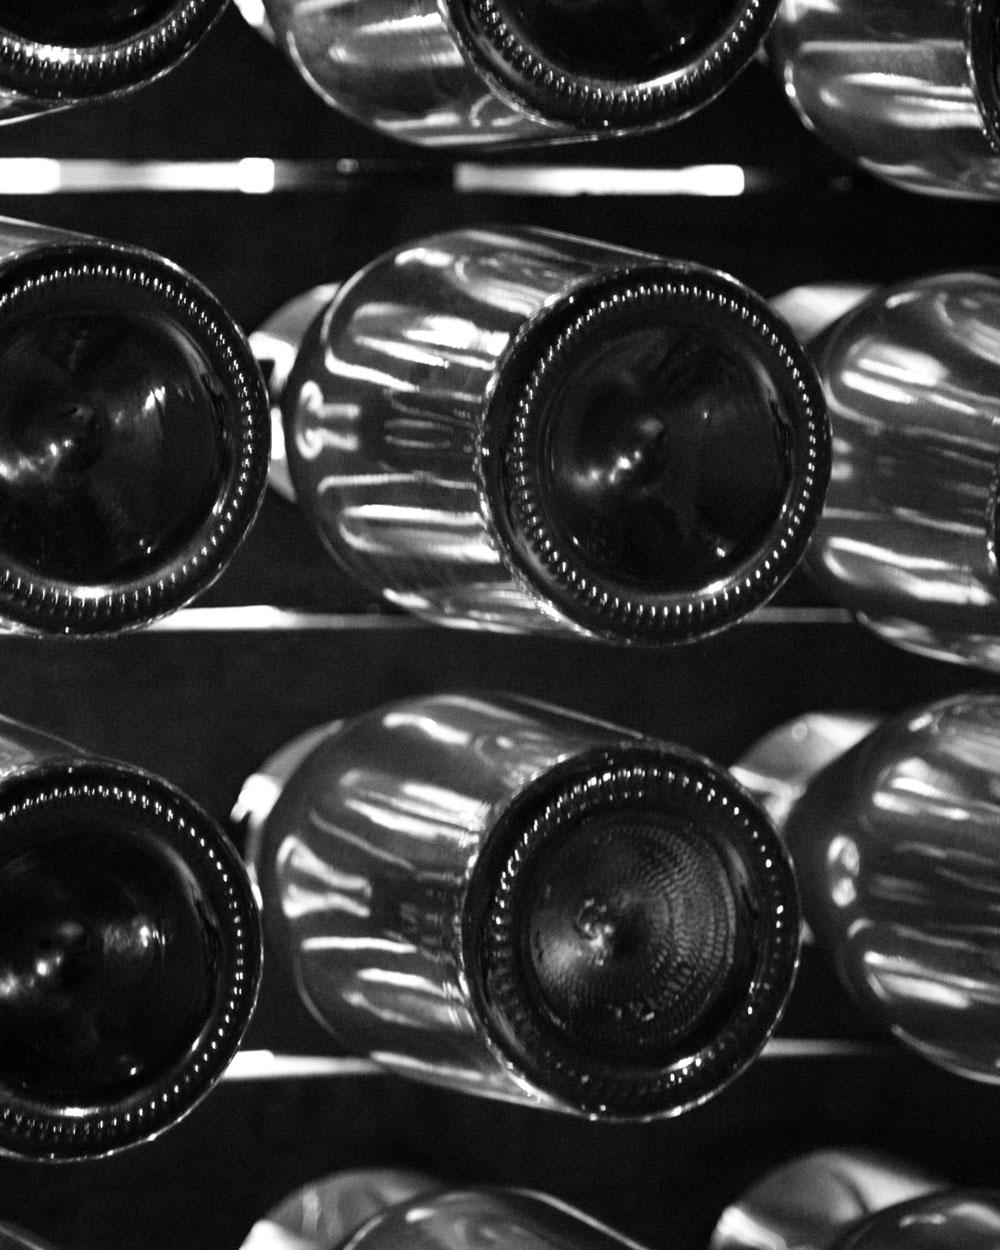 Dentro de Armand de Brignac - Armand de Brignac Champagne